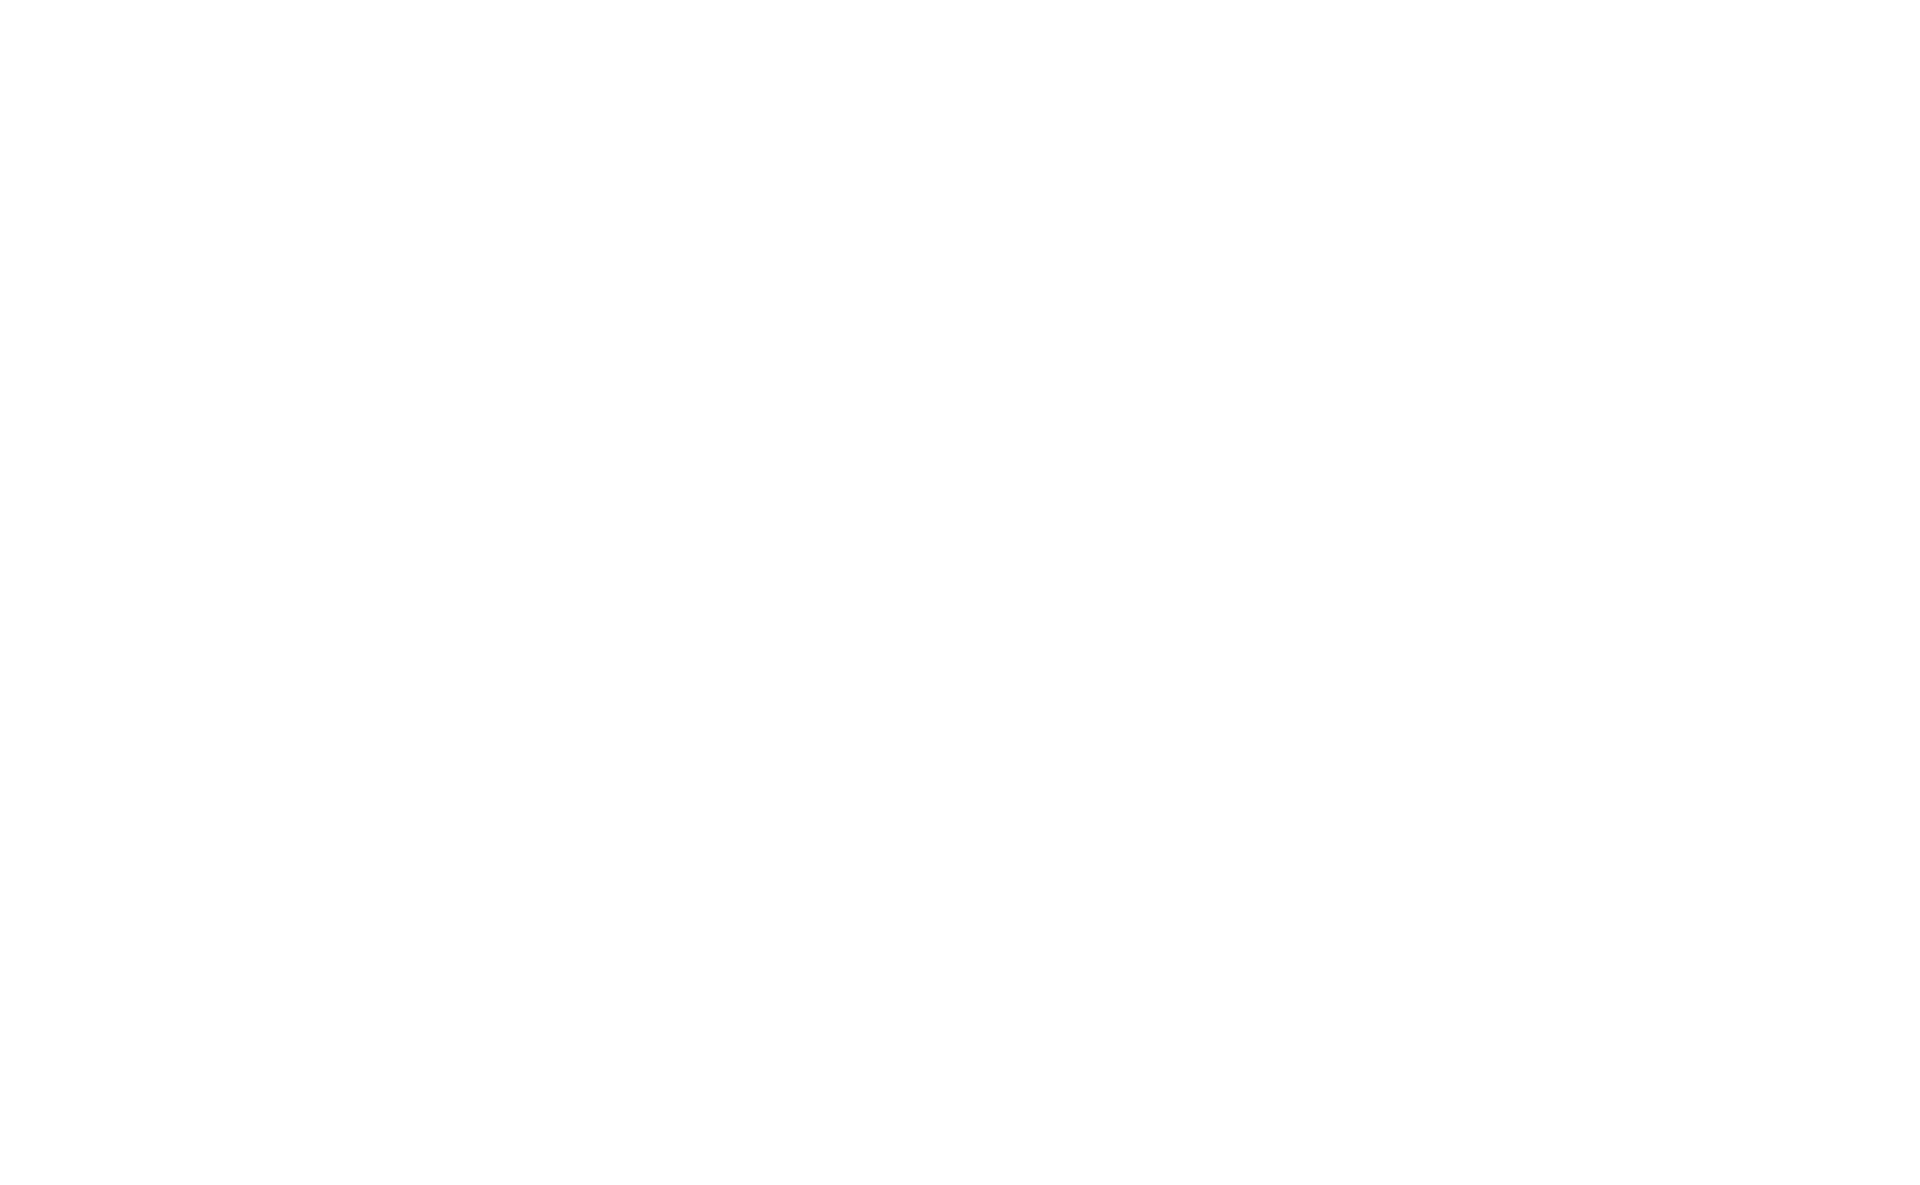 DNX_logo_white_transparent.png